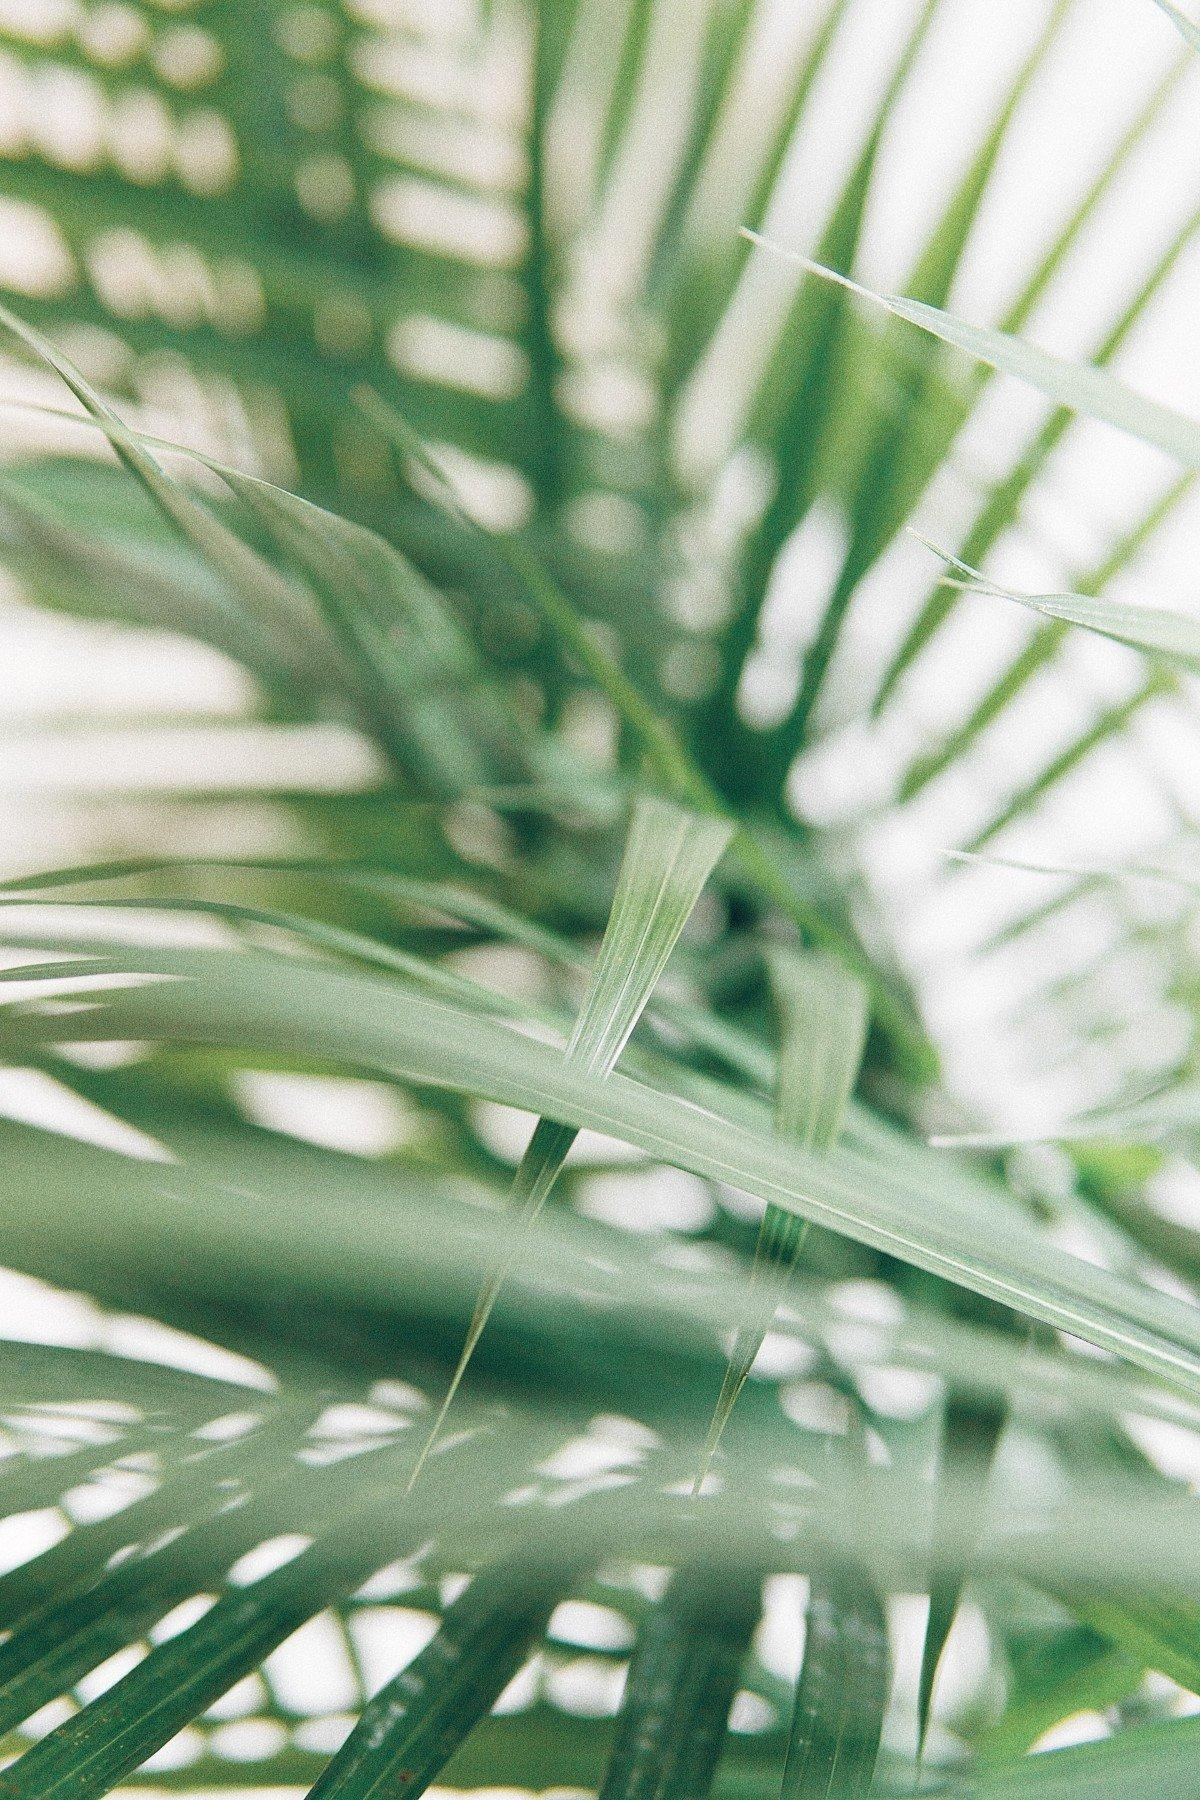 5 Greenwashing Techniques